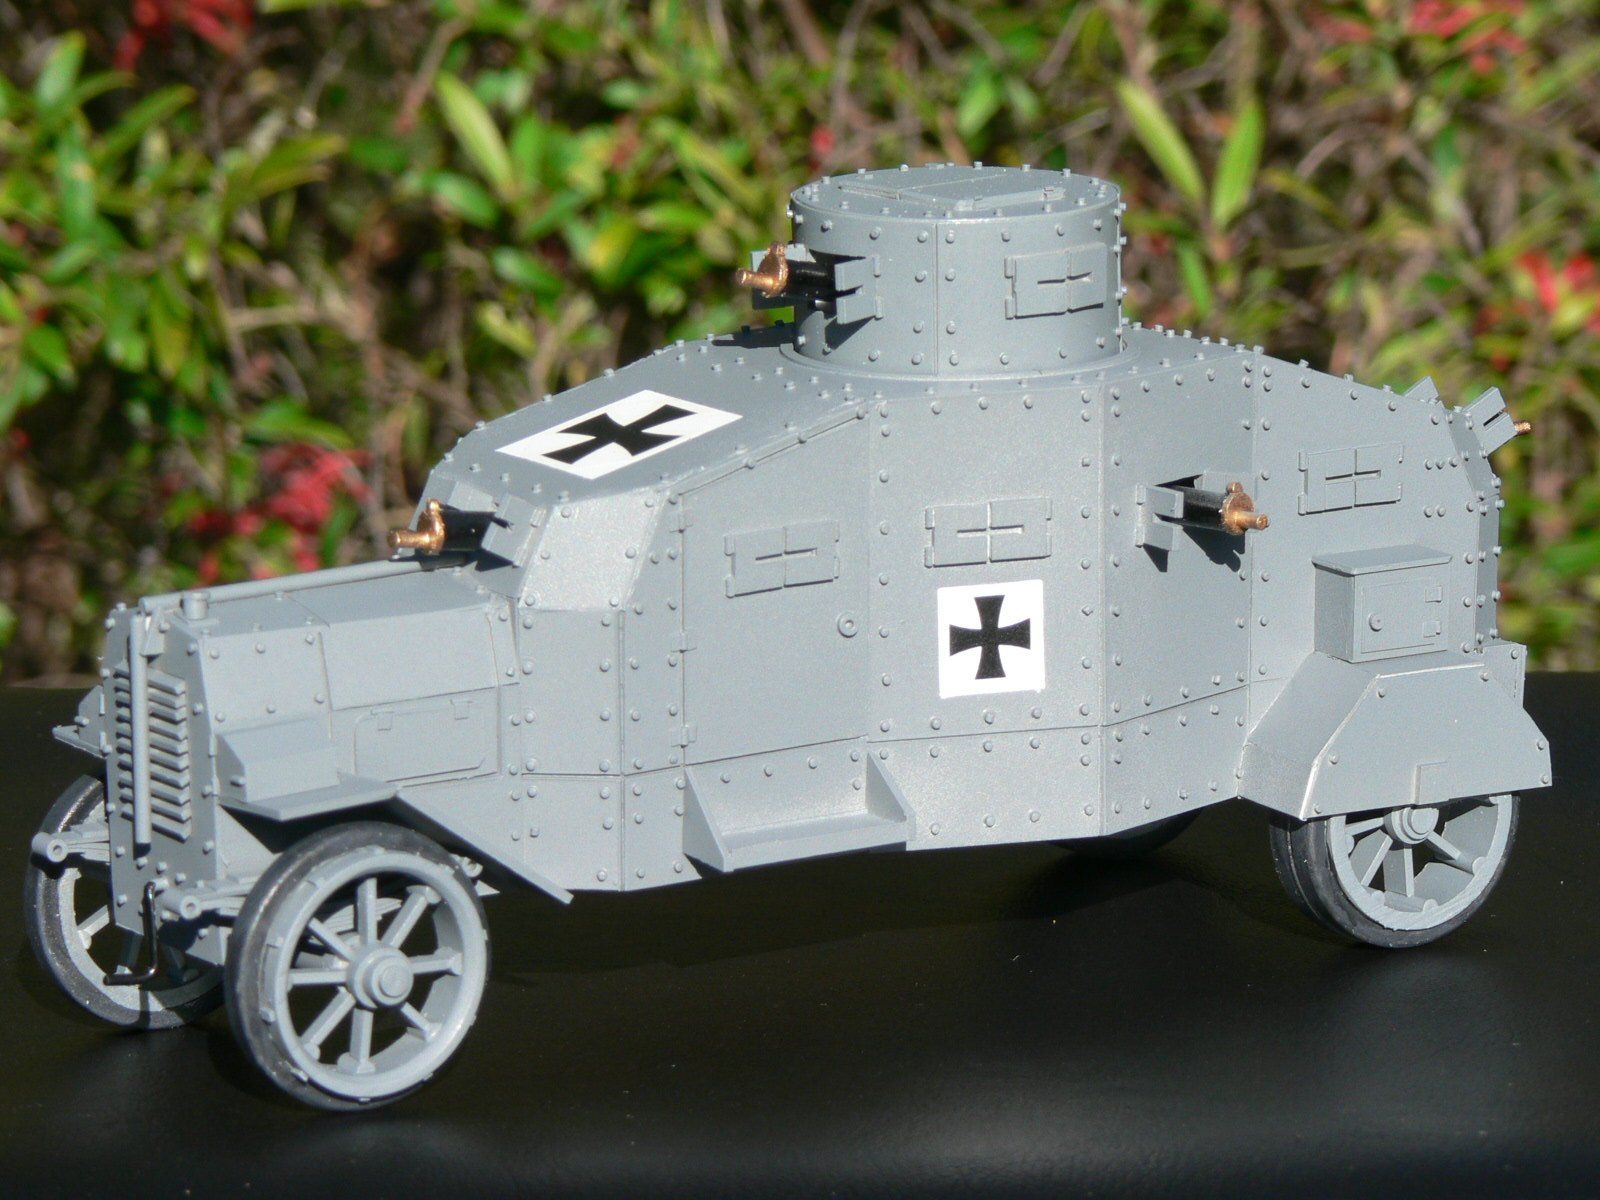 Col 39 S Tanks Ww1 German Erhardt 17 Armoured Car